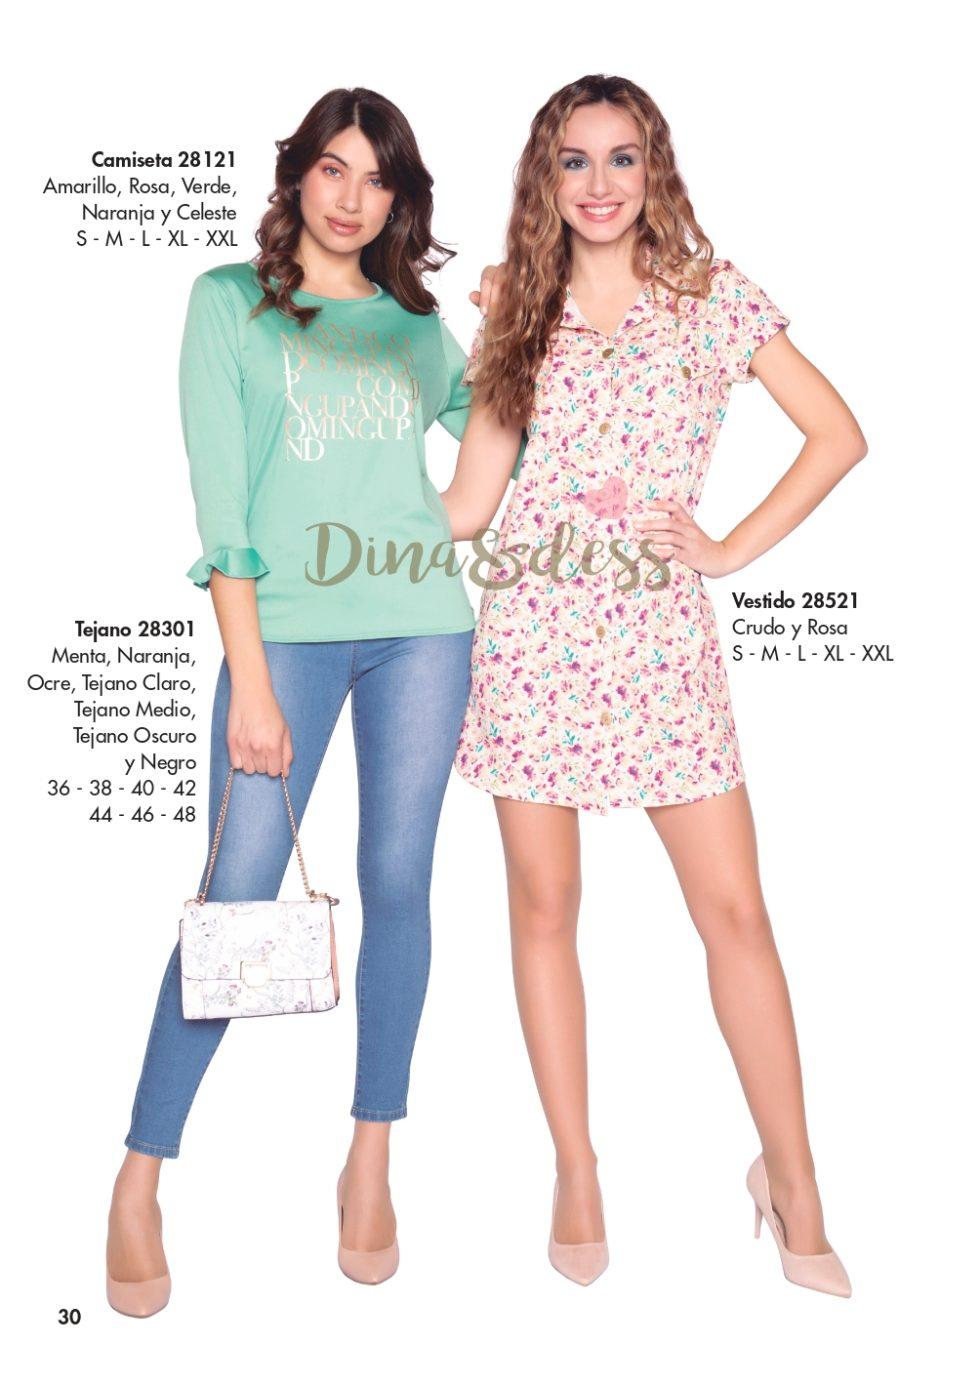 Verano 2021 Dina&Dess Clientes_page-0032